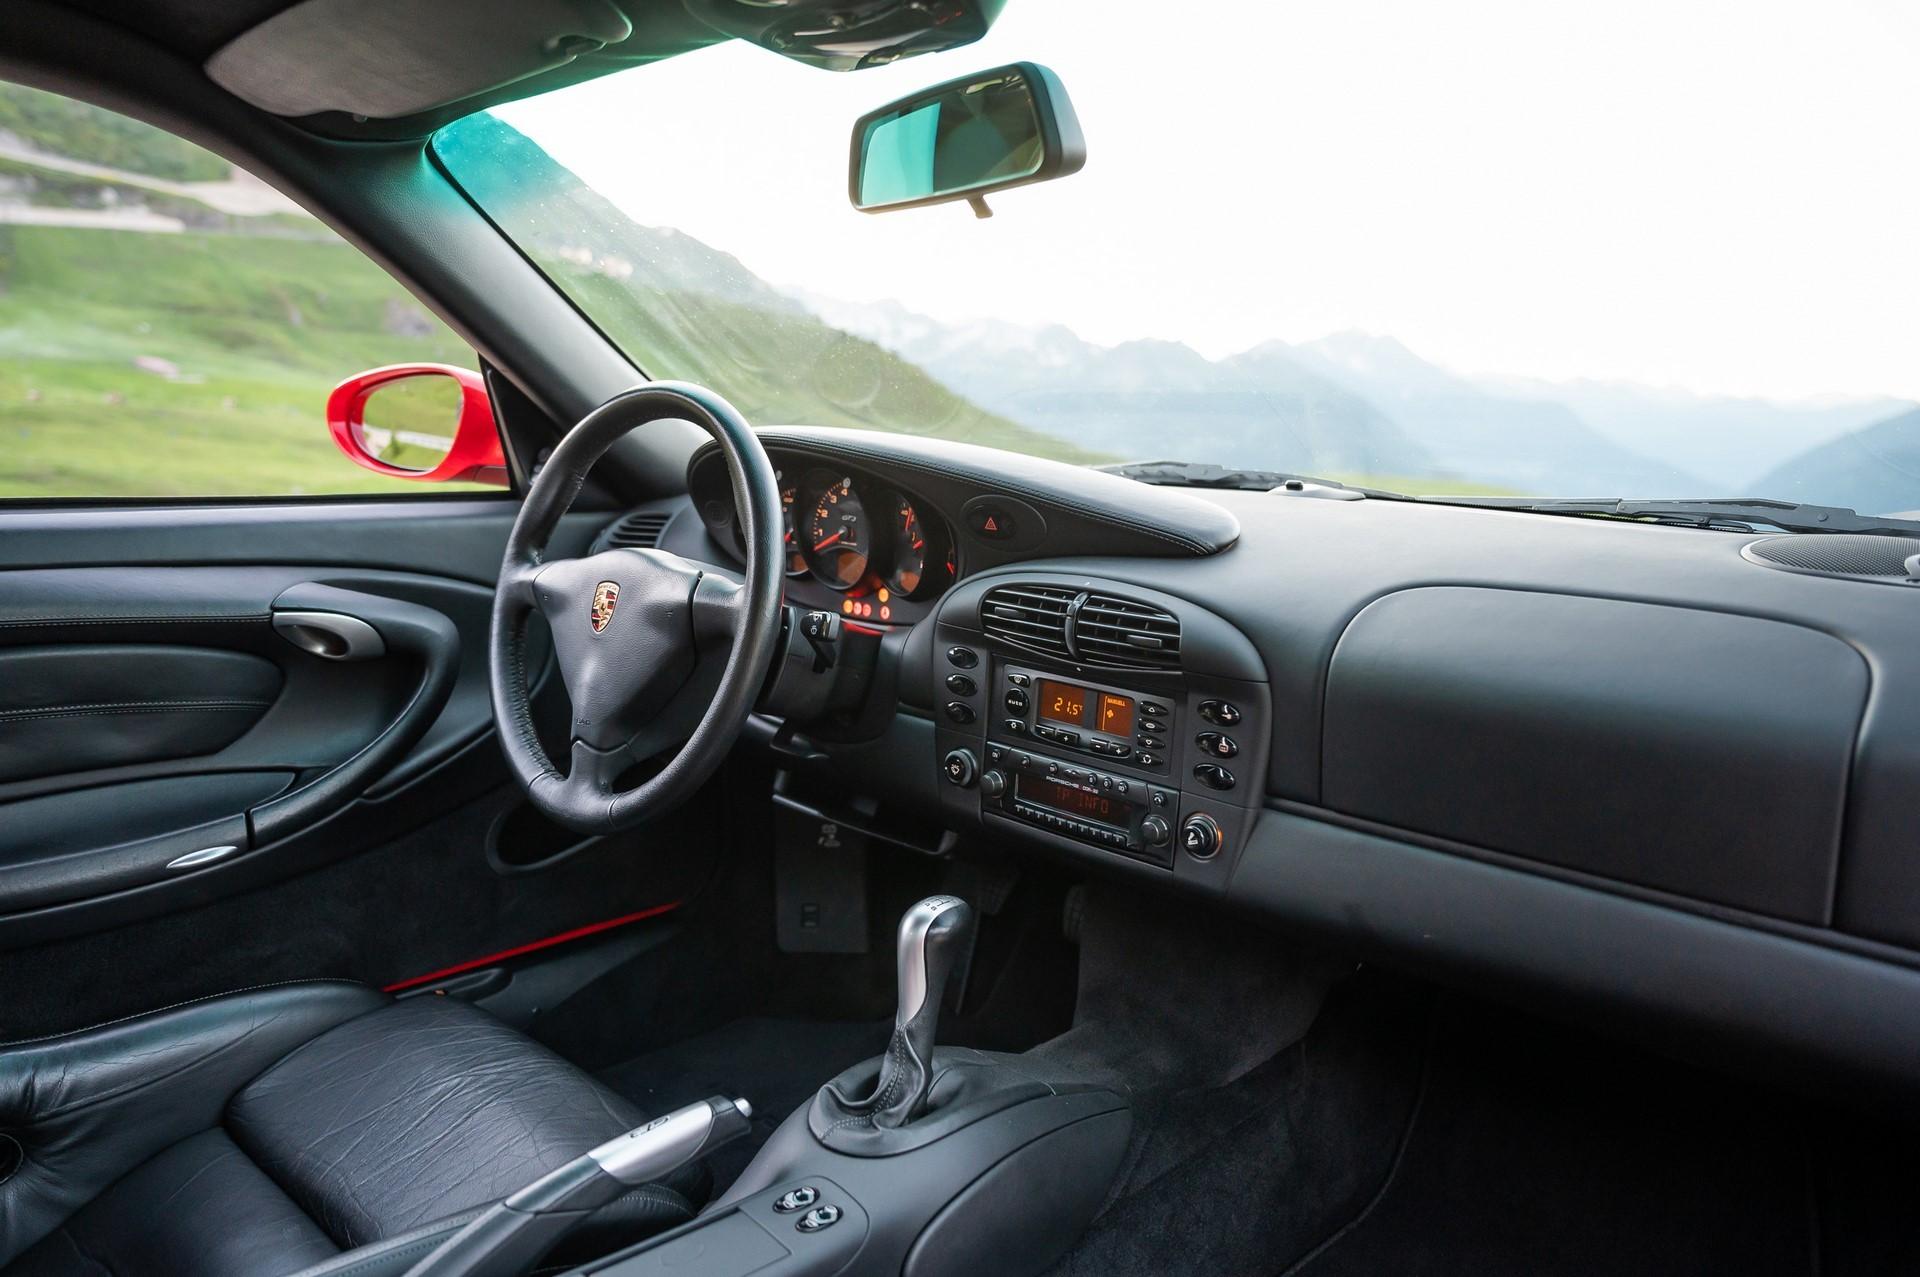 20-years-of-the-Porsche-911-GT3-22